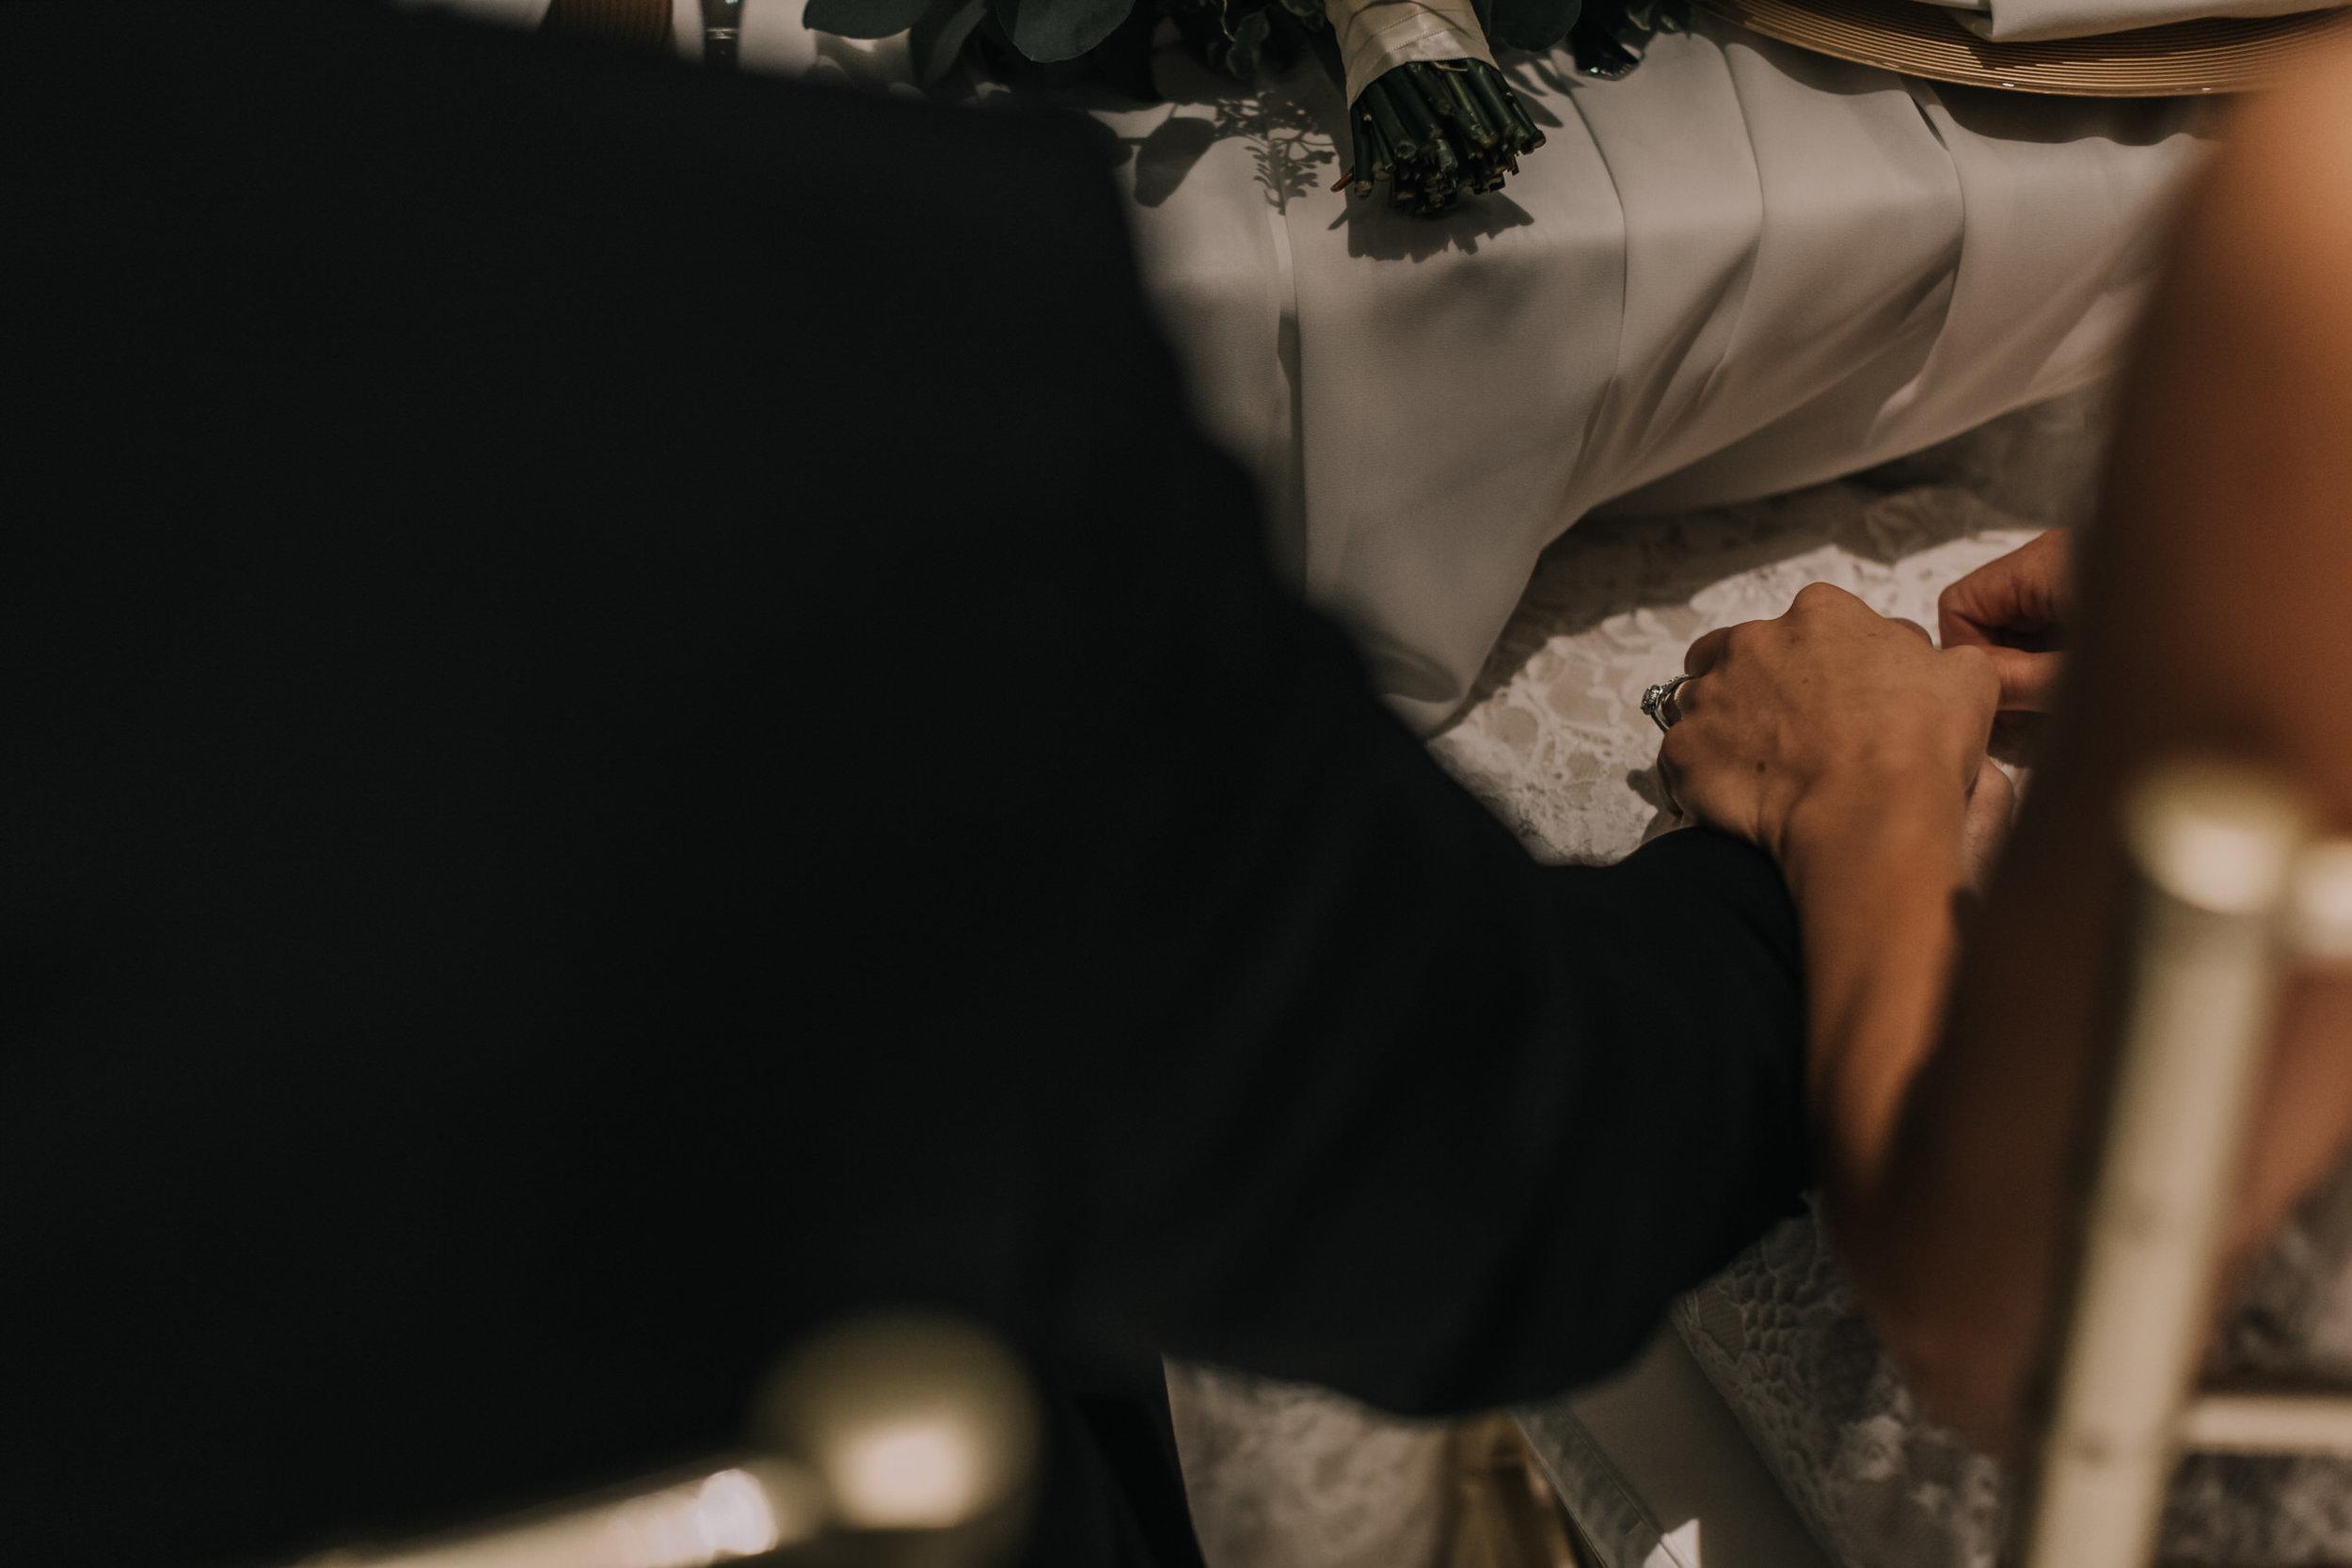 Pitt Meadows Wedding Photographer - Sky Hangar Wedding Photos - Vancouver Wedding Photographer & Videographer - Sunshine Coast Wedding Photos - Sunshine Coast Wedding Photographer - Jennifer Picard Photography - IMG_6071.jpg